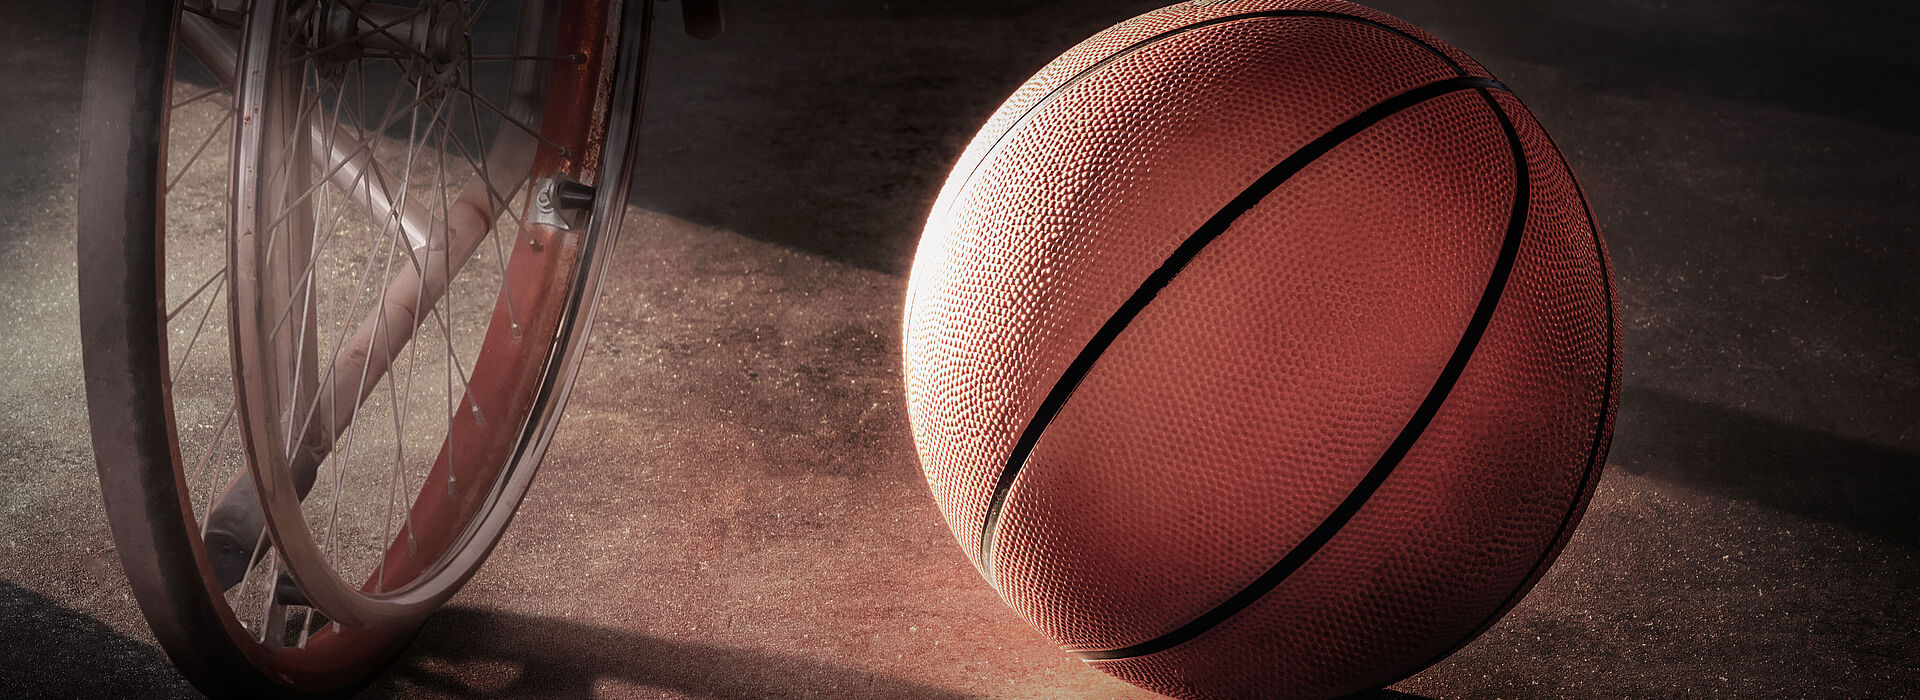 Cadeira de rodas ao lado de bola de basquete.